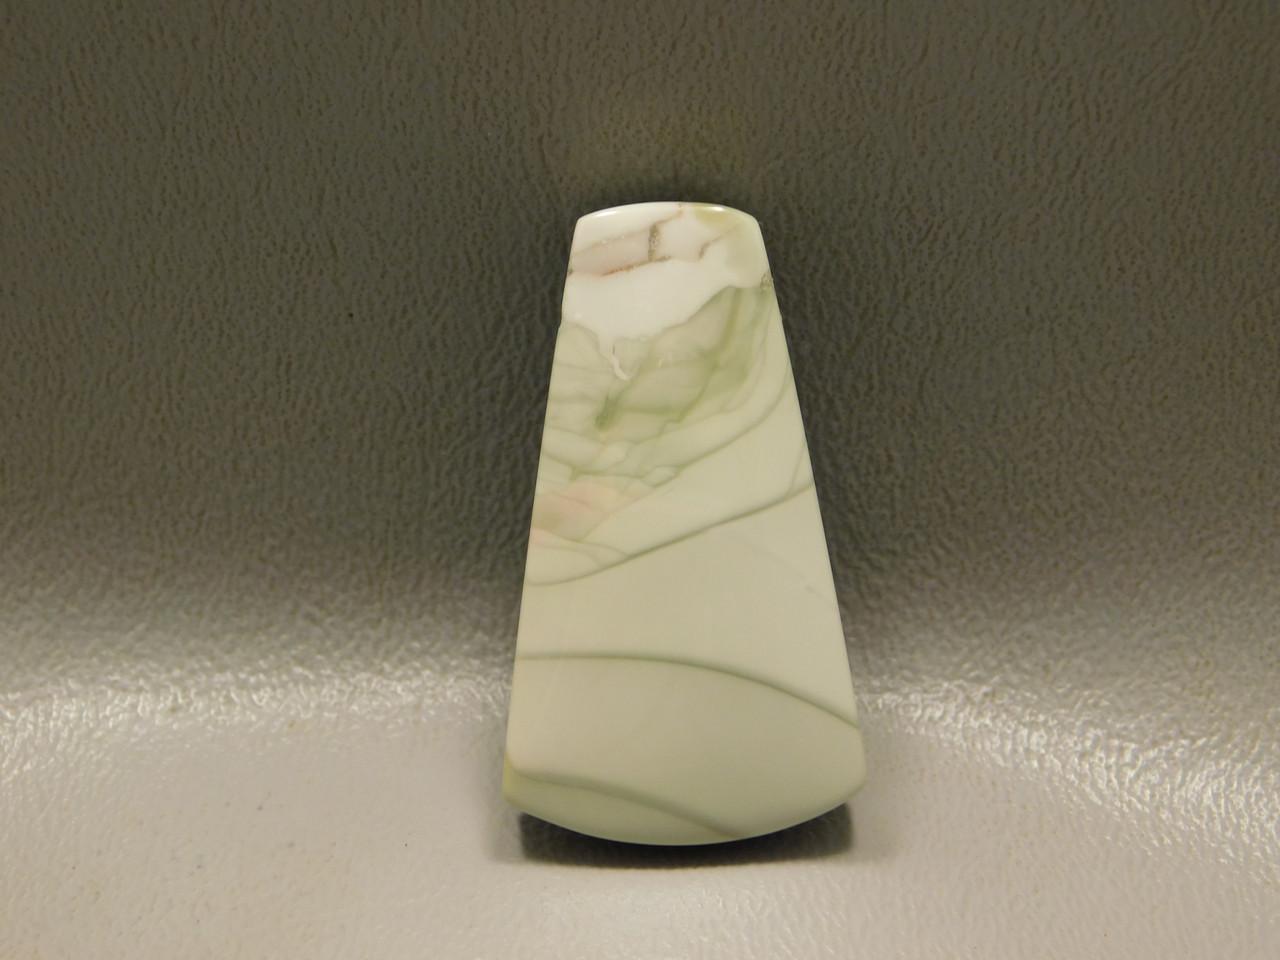 Willow Creek Jasper Drilled Stone Bead Pendant #9